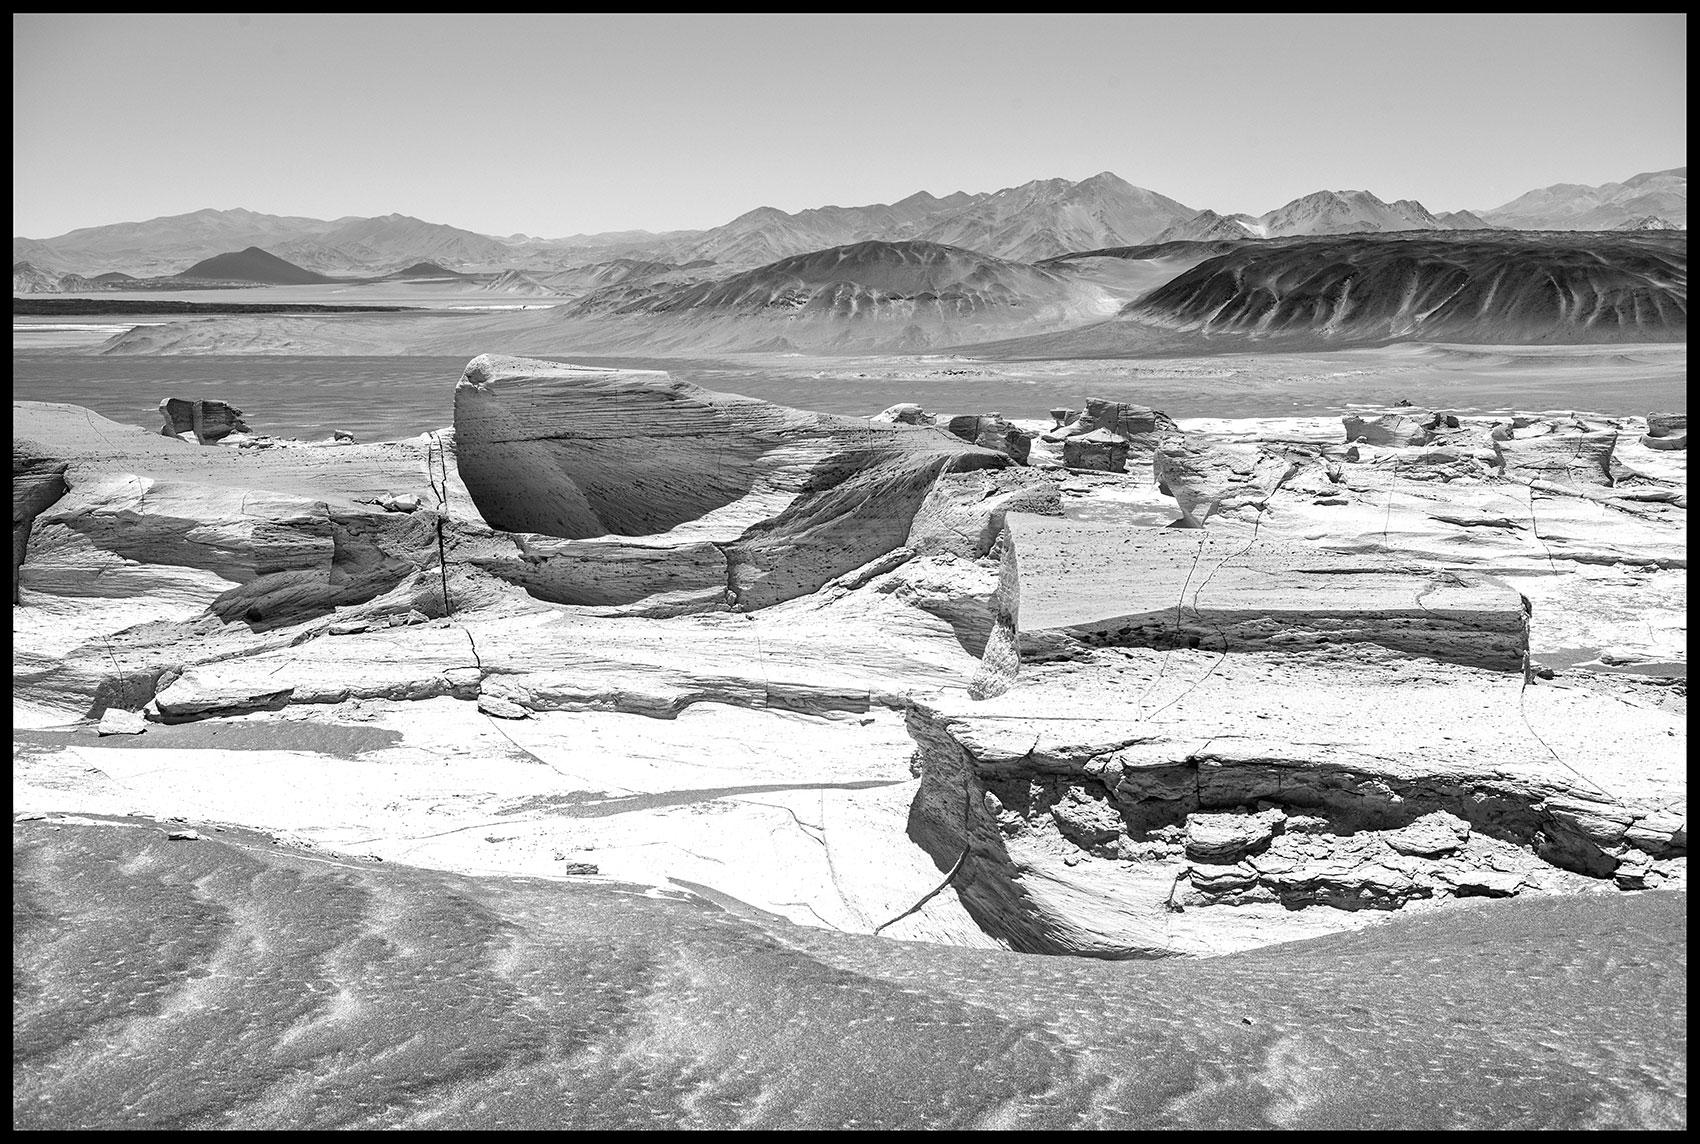 Desert Sculptures | Stefano Paradiso - Photographer